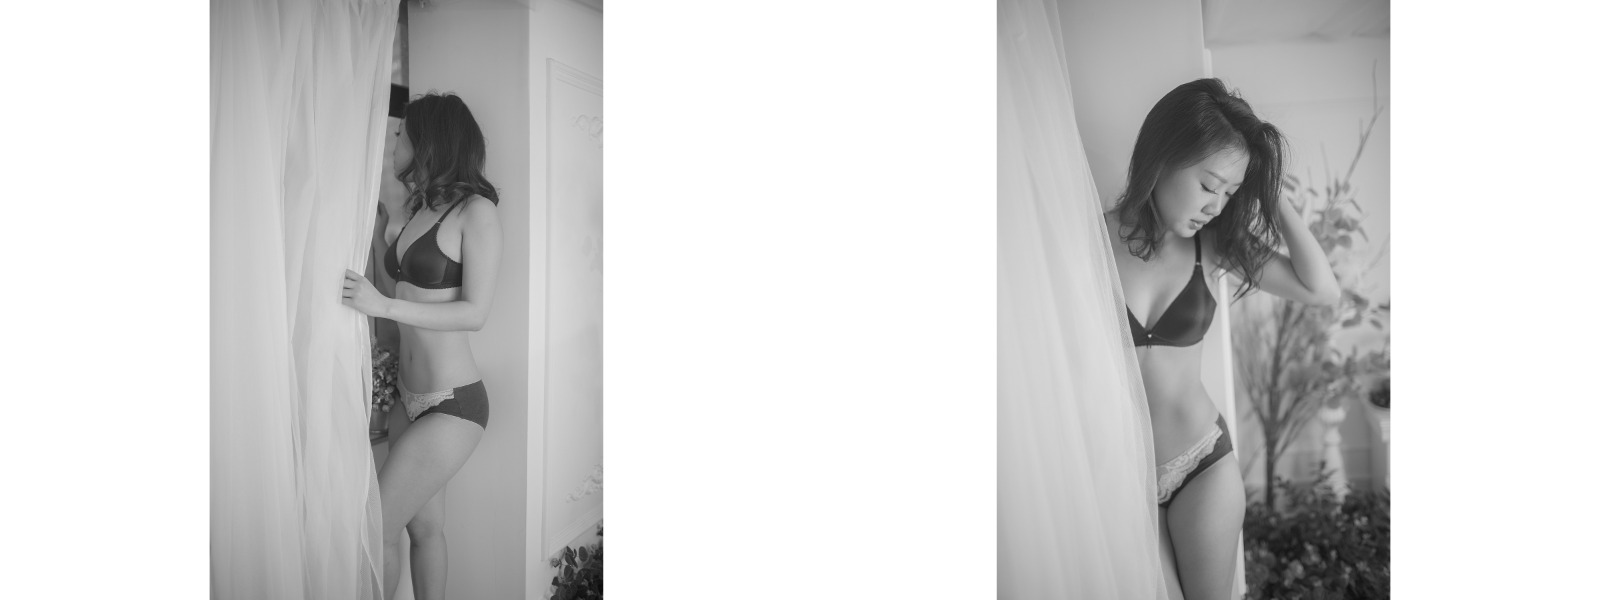 香港個人閨蜜寫真服務推薦 paulstylist best Boudoir Portrait photography Recommend hk 8